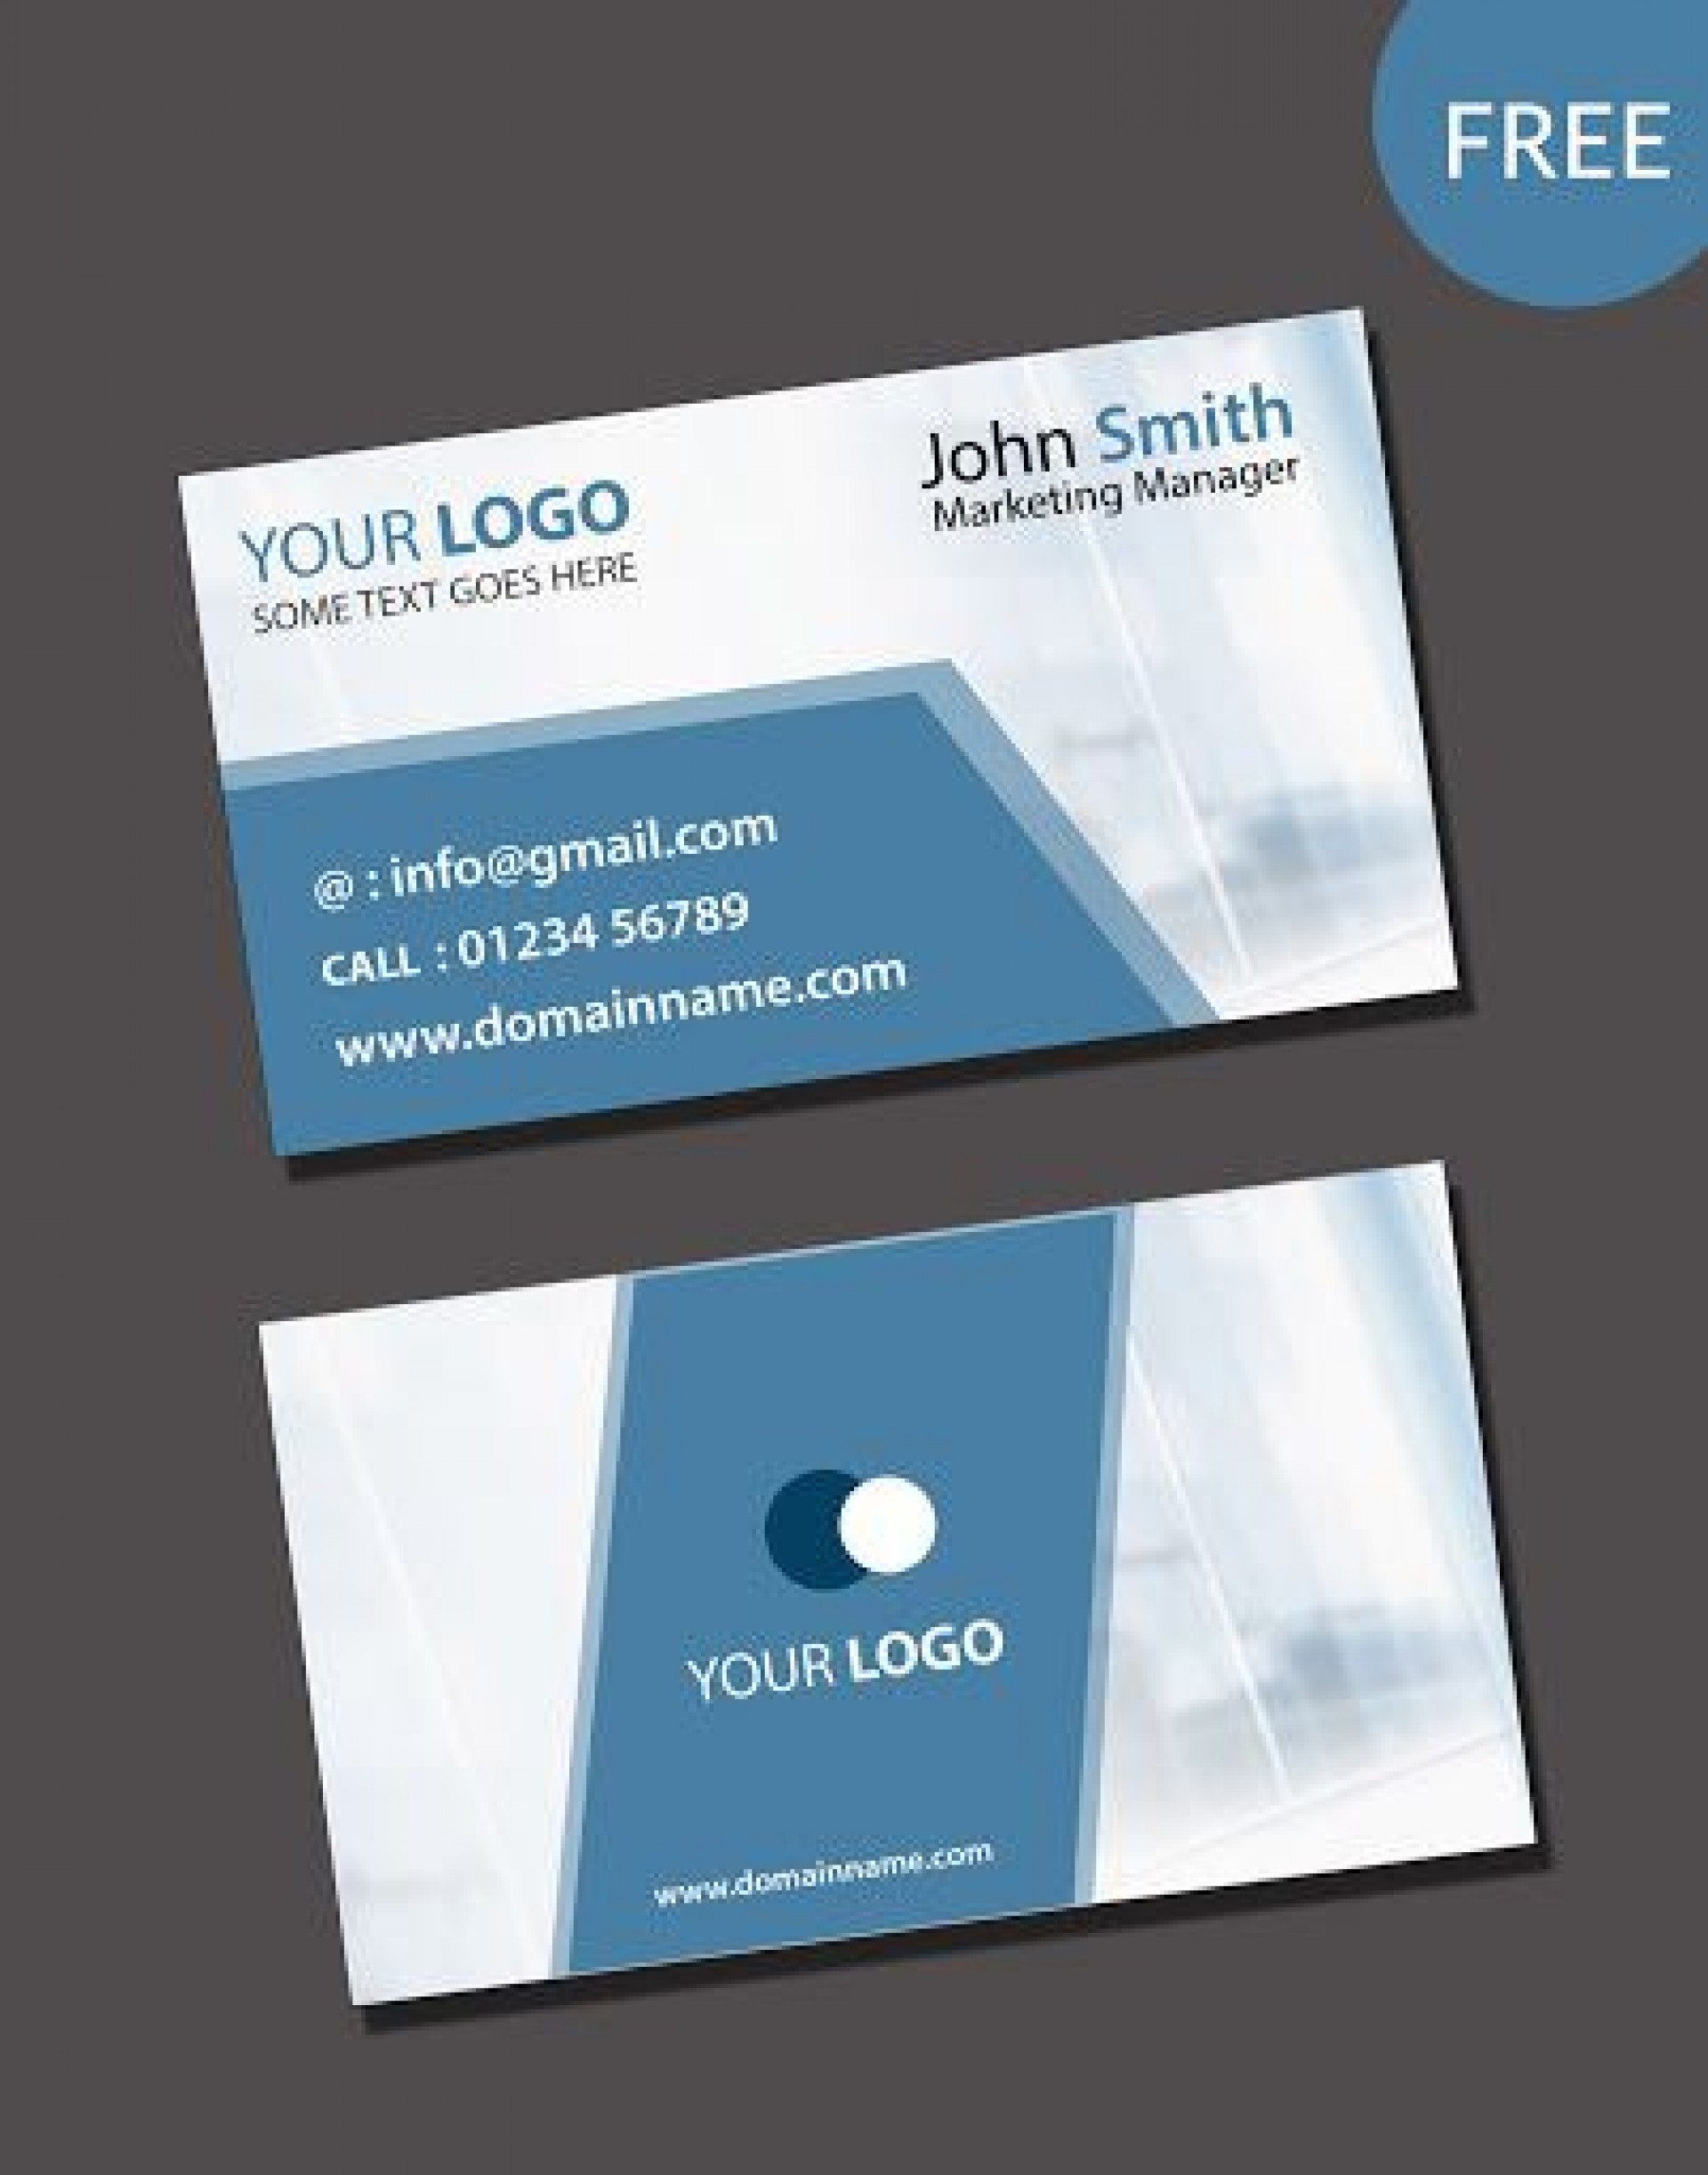 009 Unforgettable Free Visiting Card Design Psd Download Sample  Busines Restaurant1920